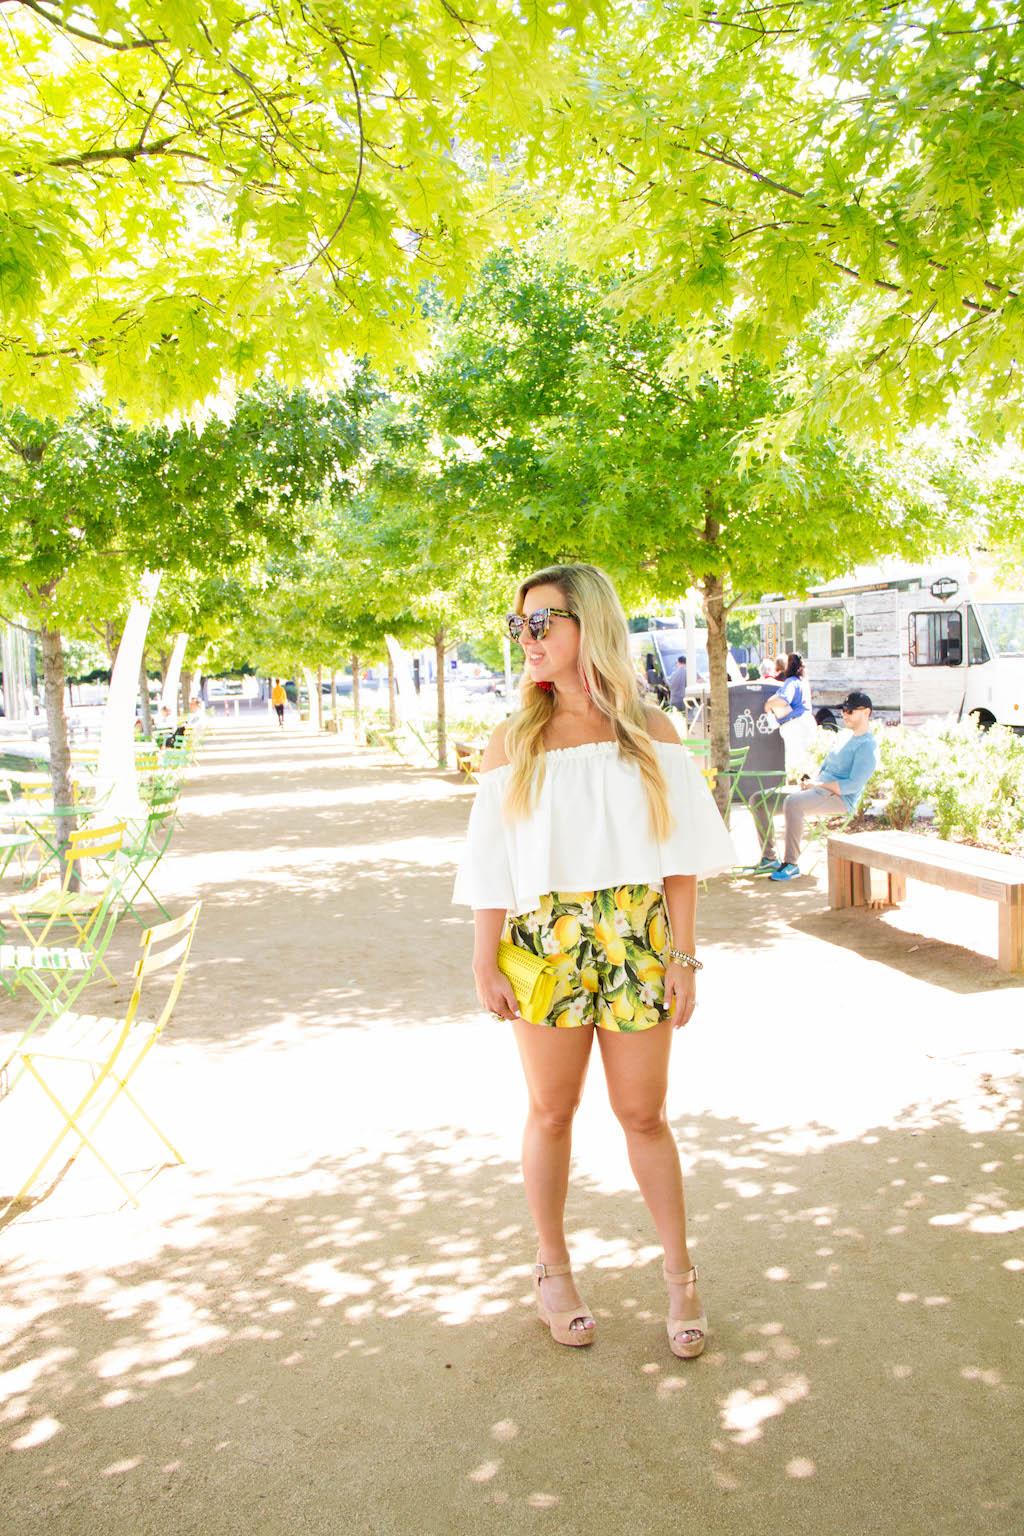 For The Love Of Lemons - Citrus Shorts | The Darling Petite Diva | Nicole Kirk